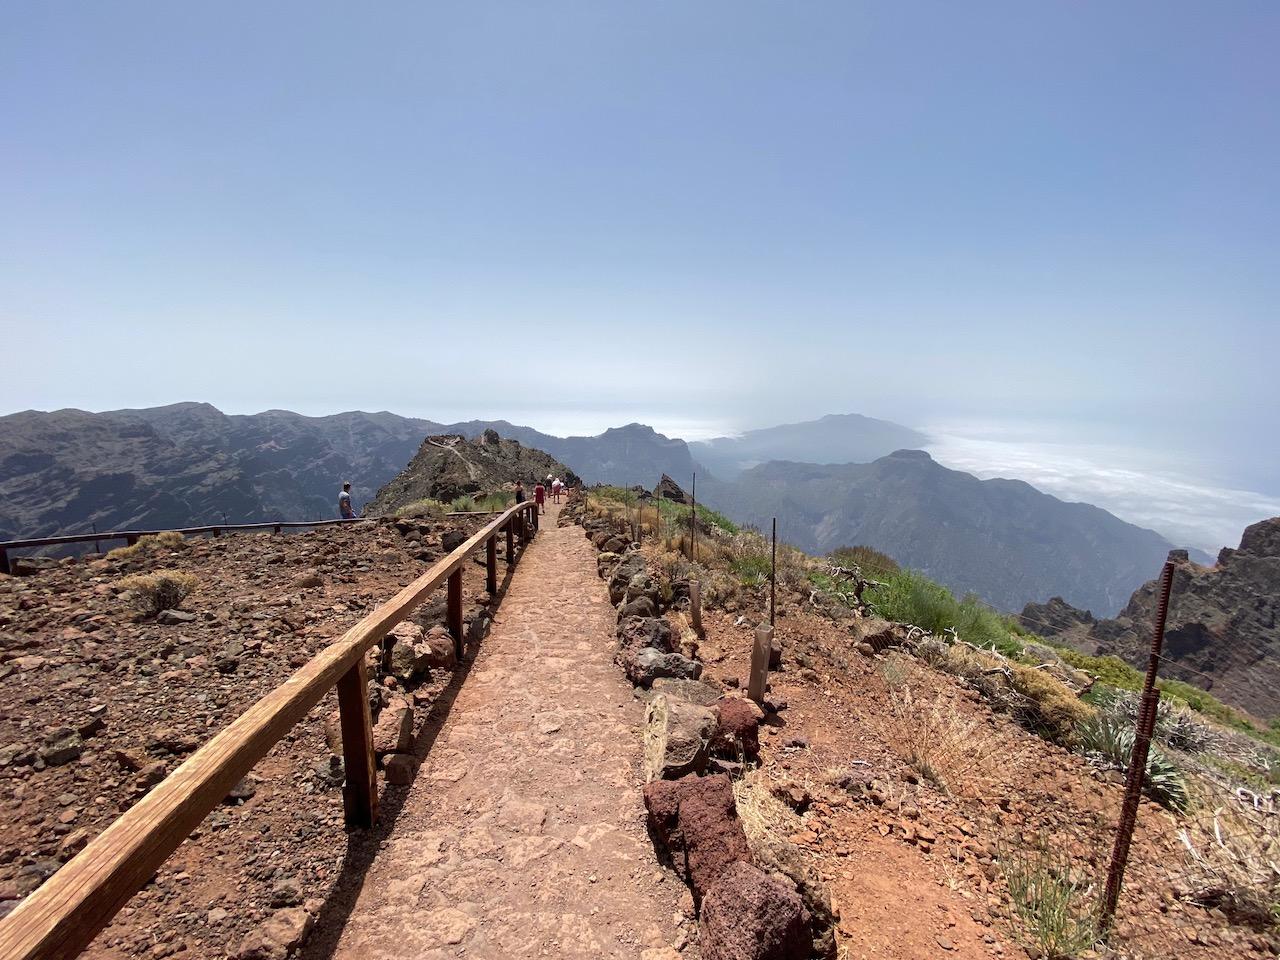 On the top of La Palma